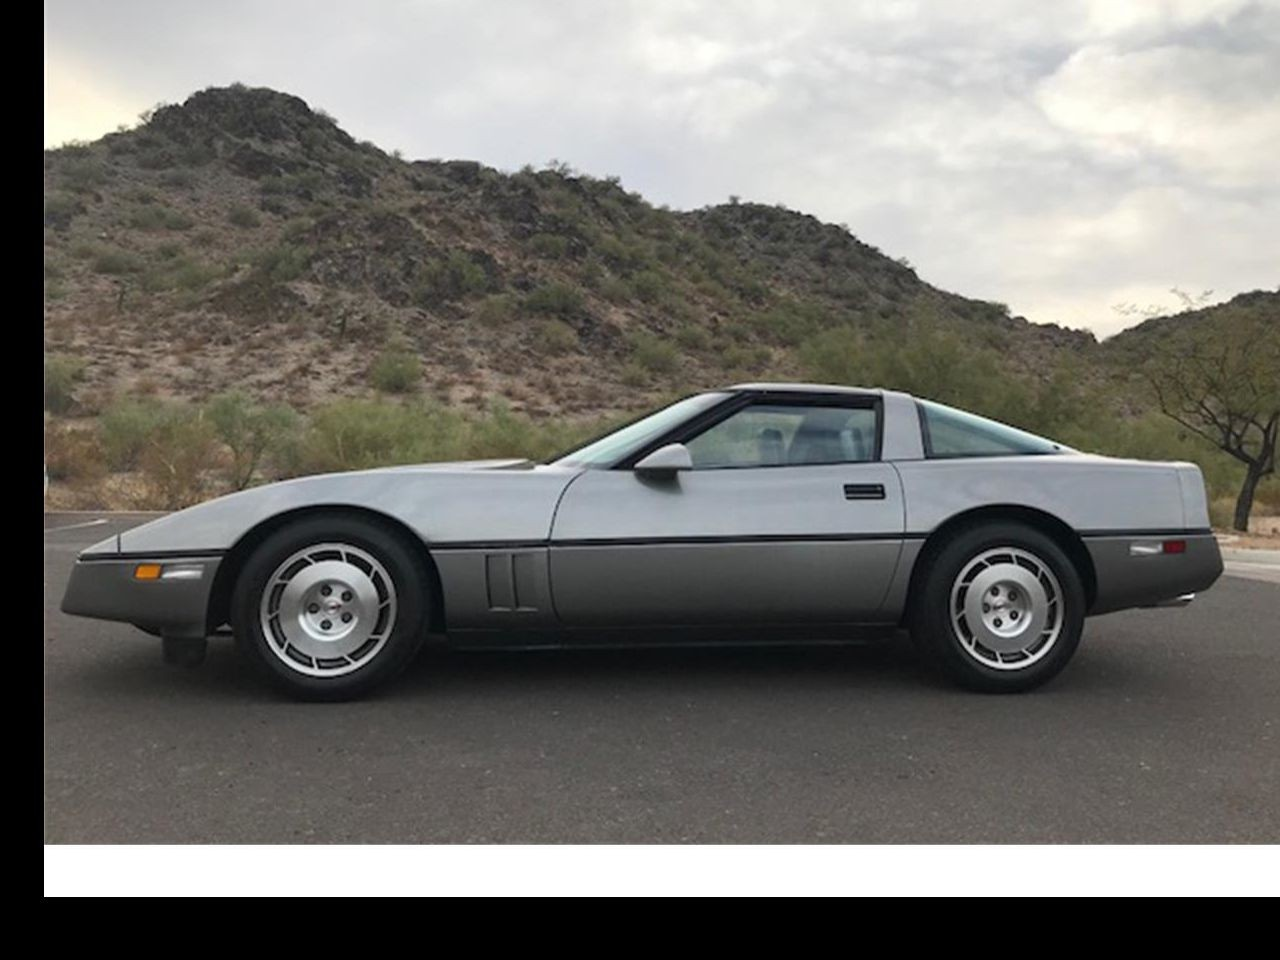 1986 Chevrolet Corvette Coupe - Z51